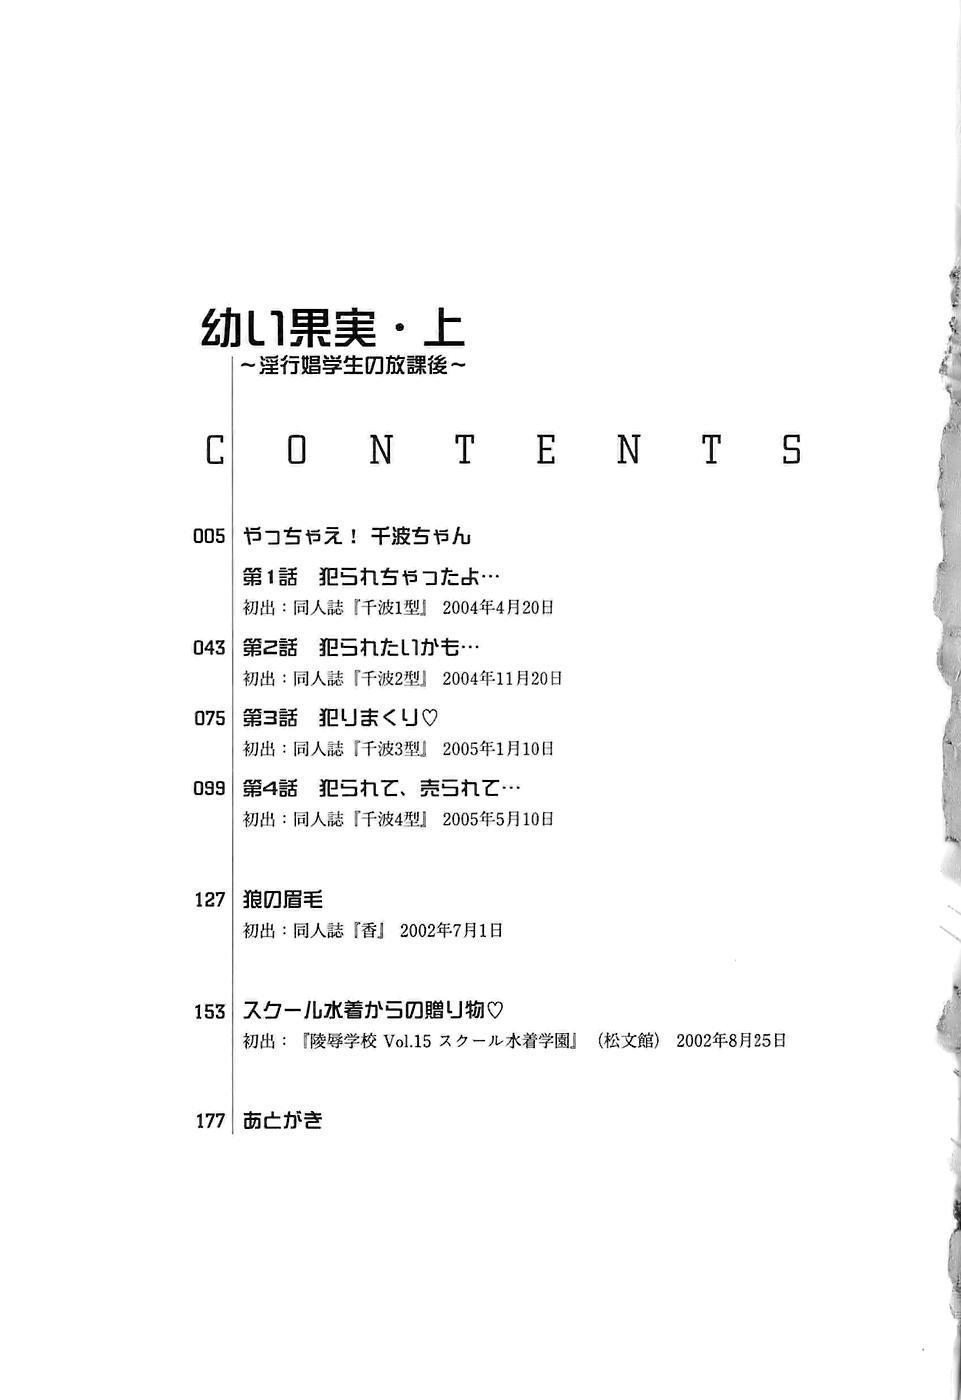 [Bow Rei] Osanai Kajitsu -Inkou Shougakusei no Houkago- Jou 4